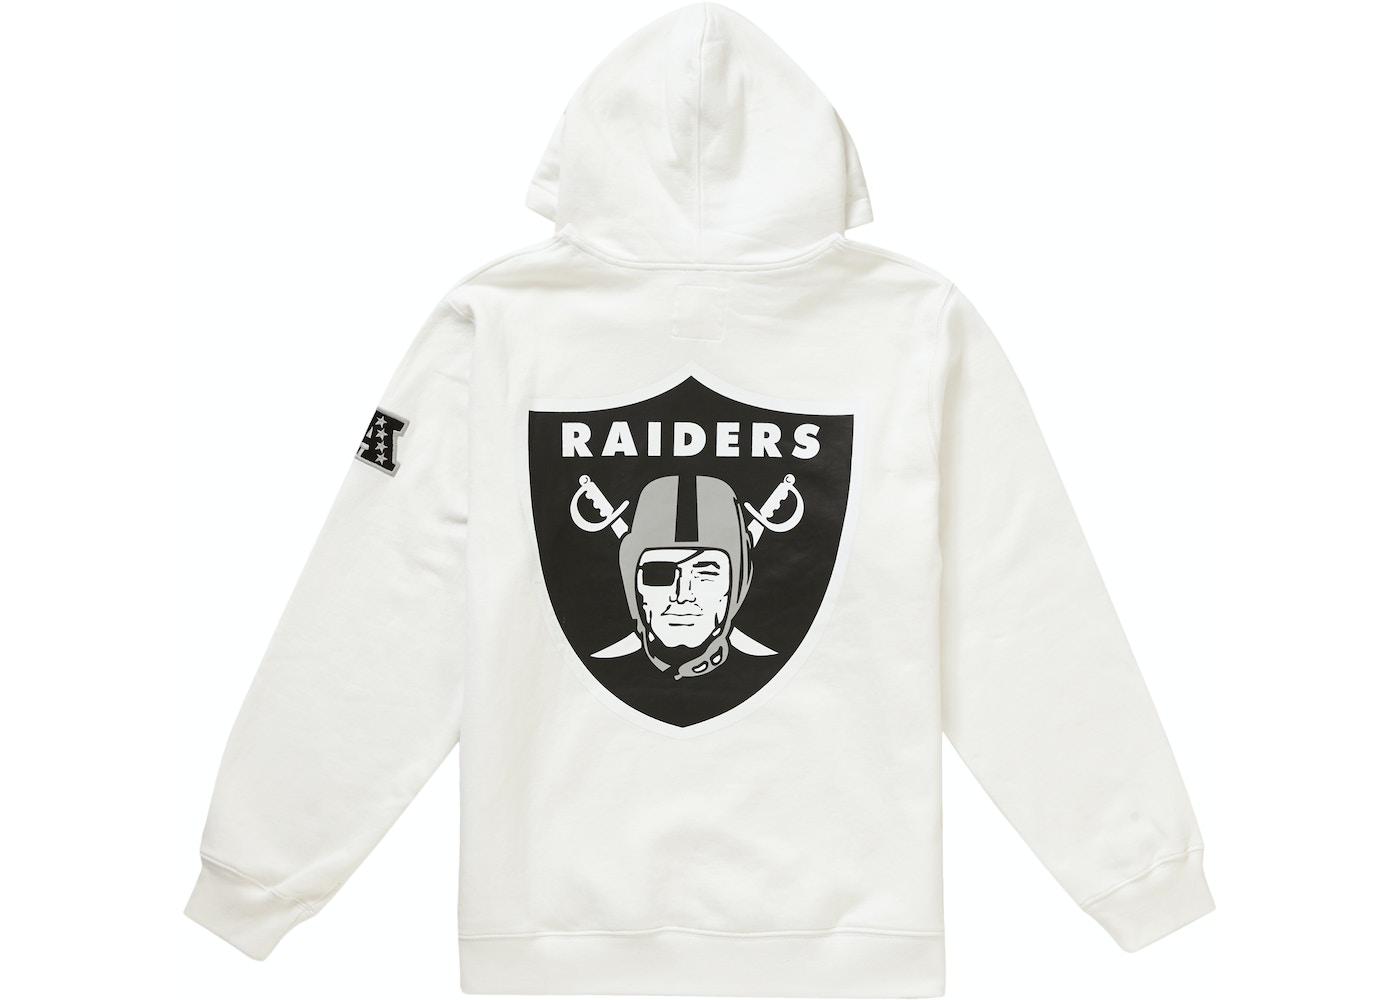 06265821 Supreme NFL x Raiders x '47 Hooded Sweatshirt White - SS19